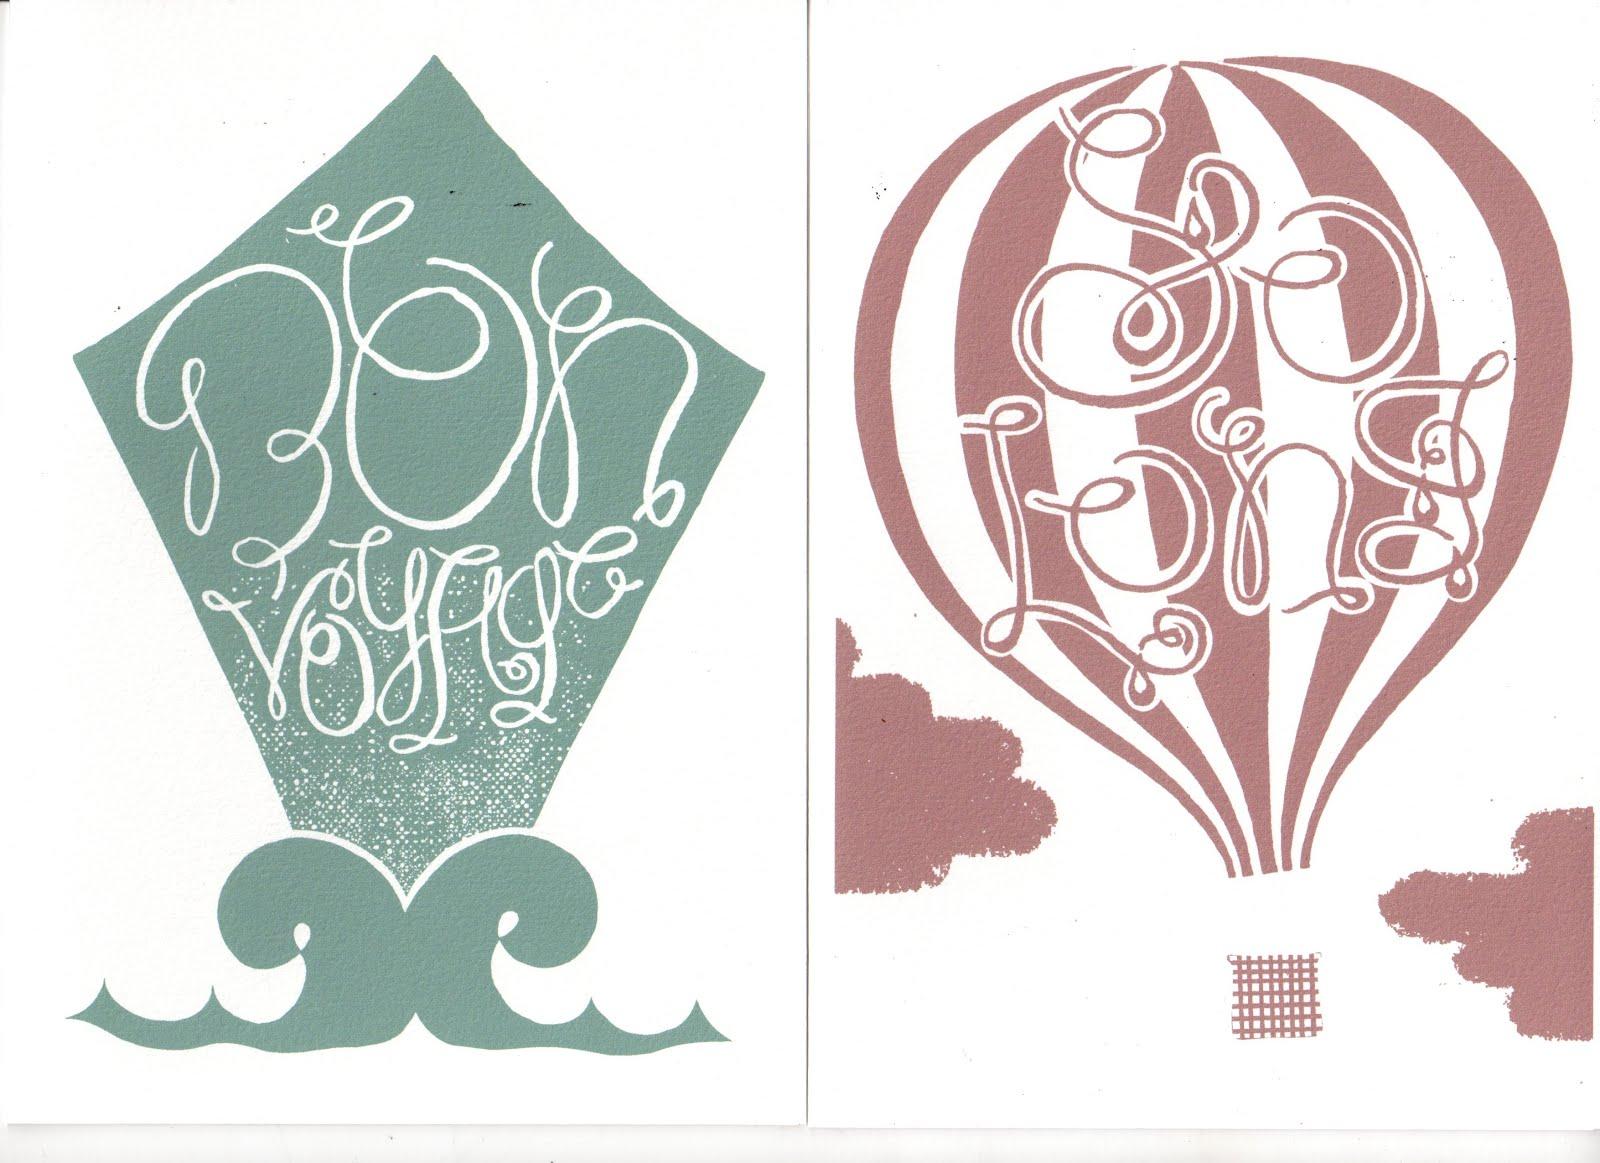 Adam barnett design revisited card designs 39 bon voyage 39 for Sejour design